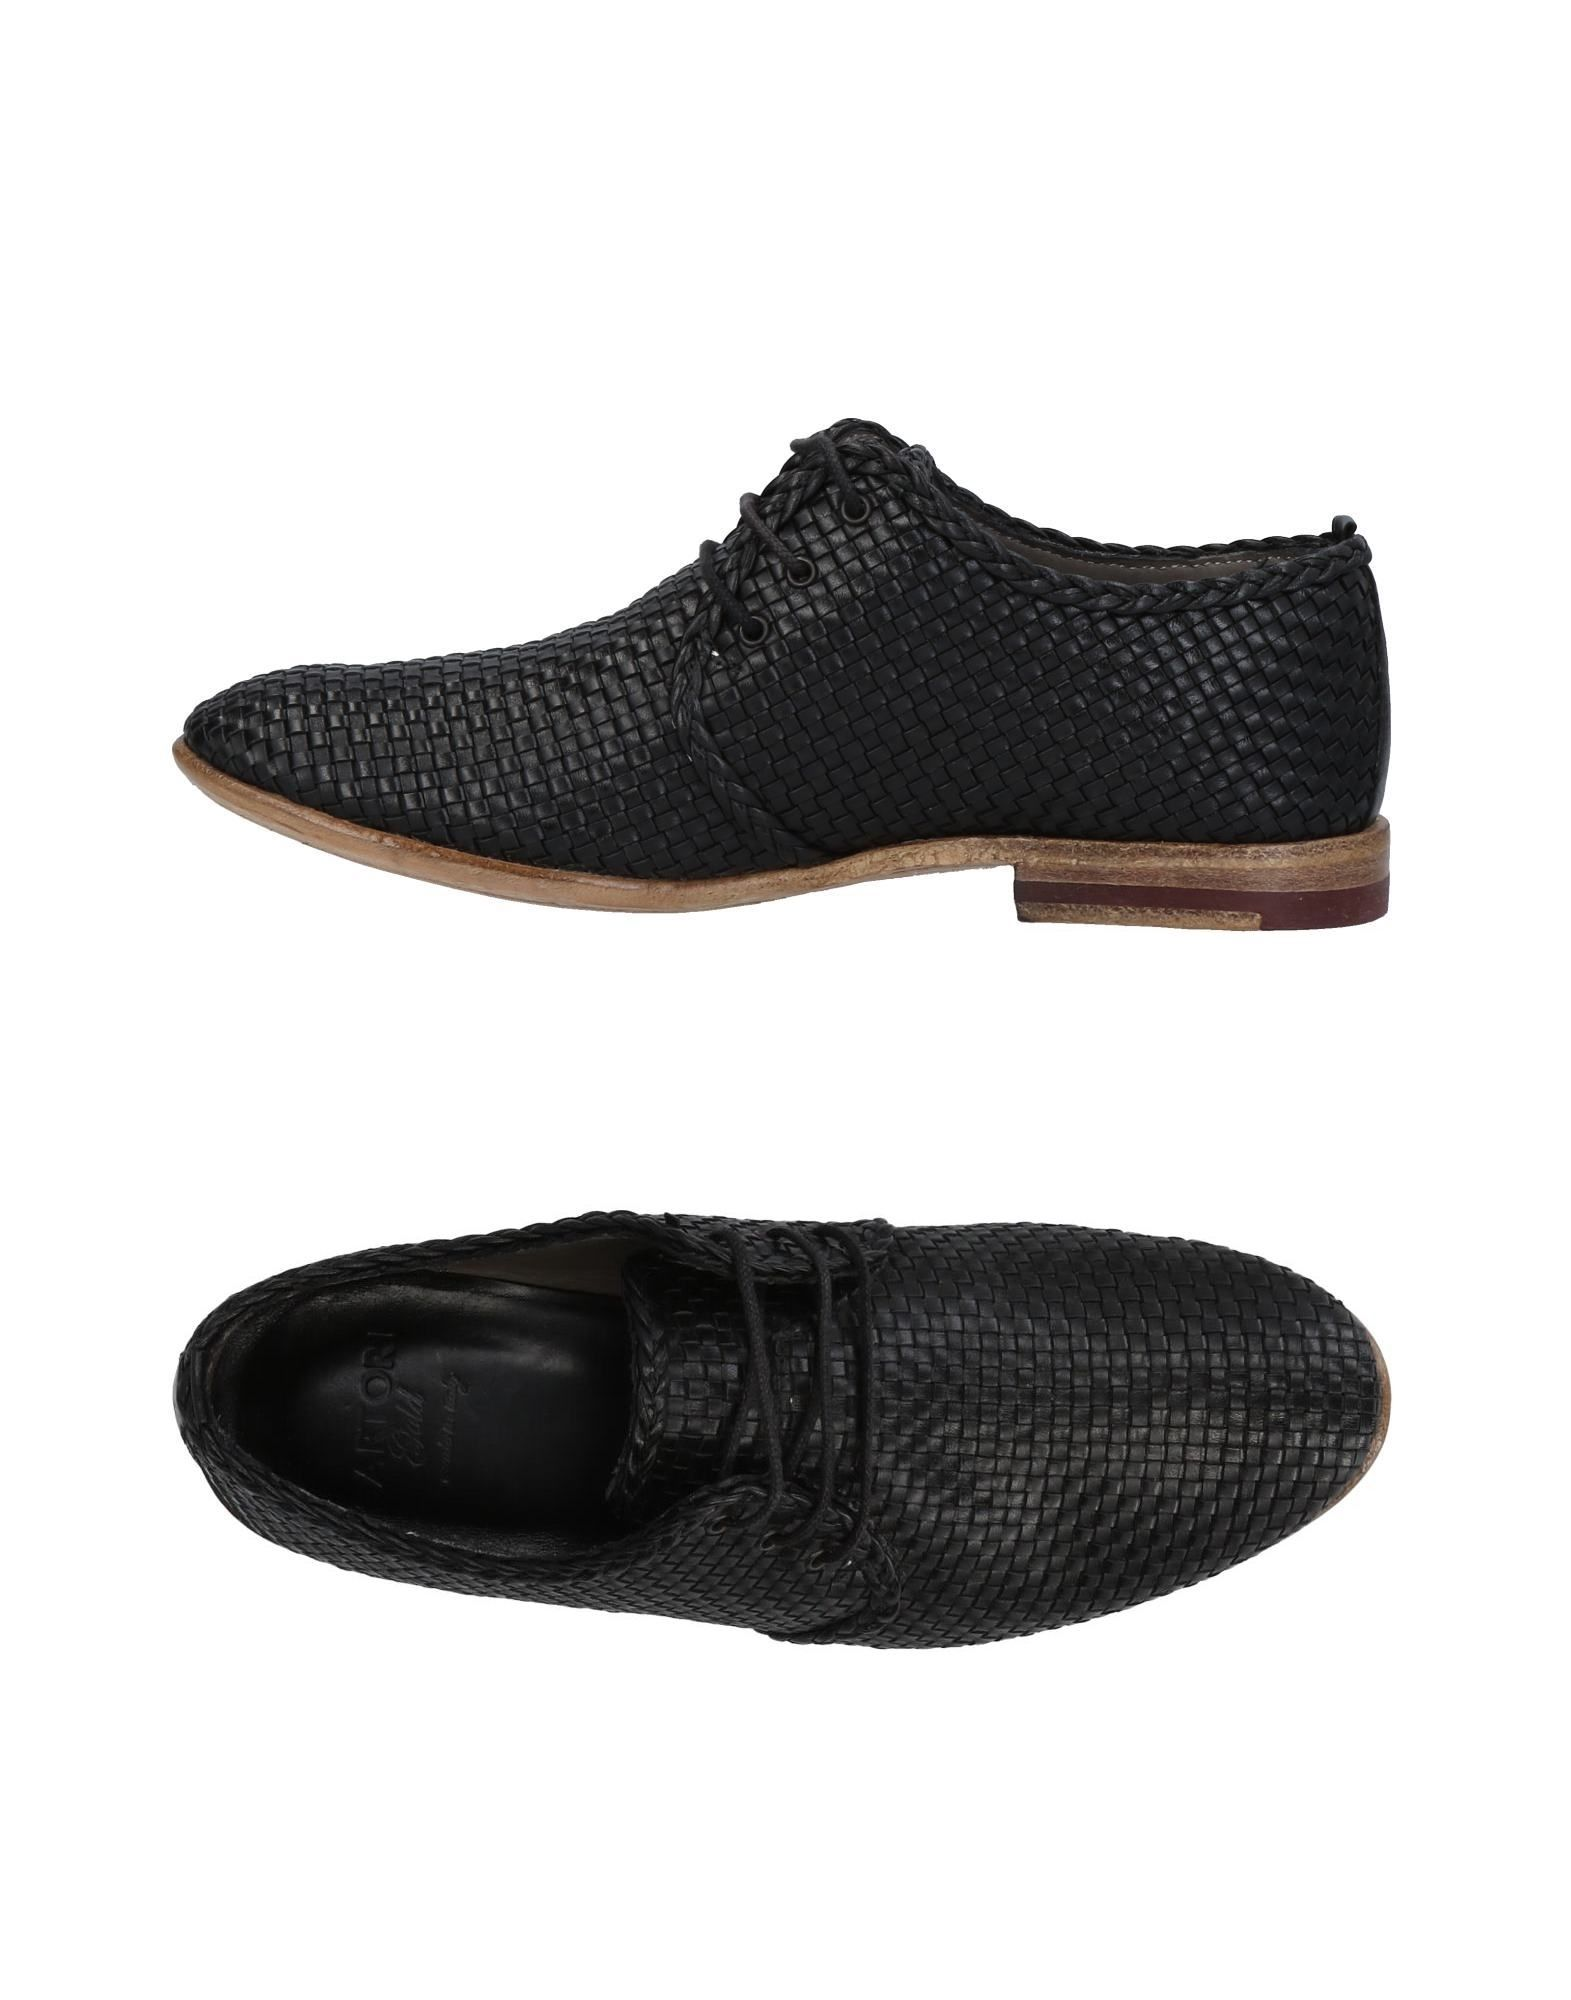 Sartori Gold Schnürschuhe Damen  11443975KX Gute Qualität beliebte Schuhe